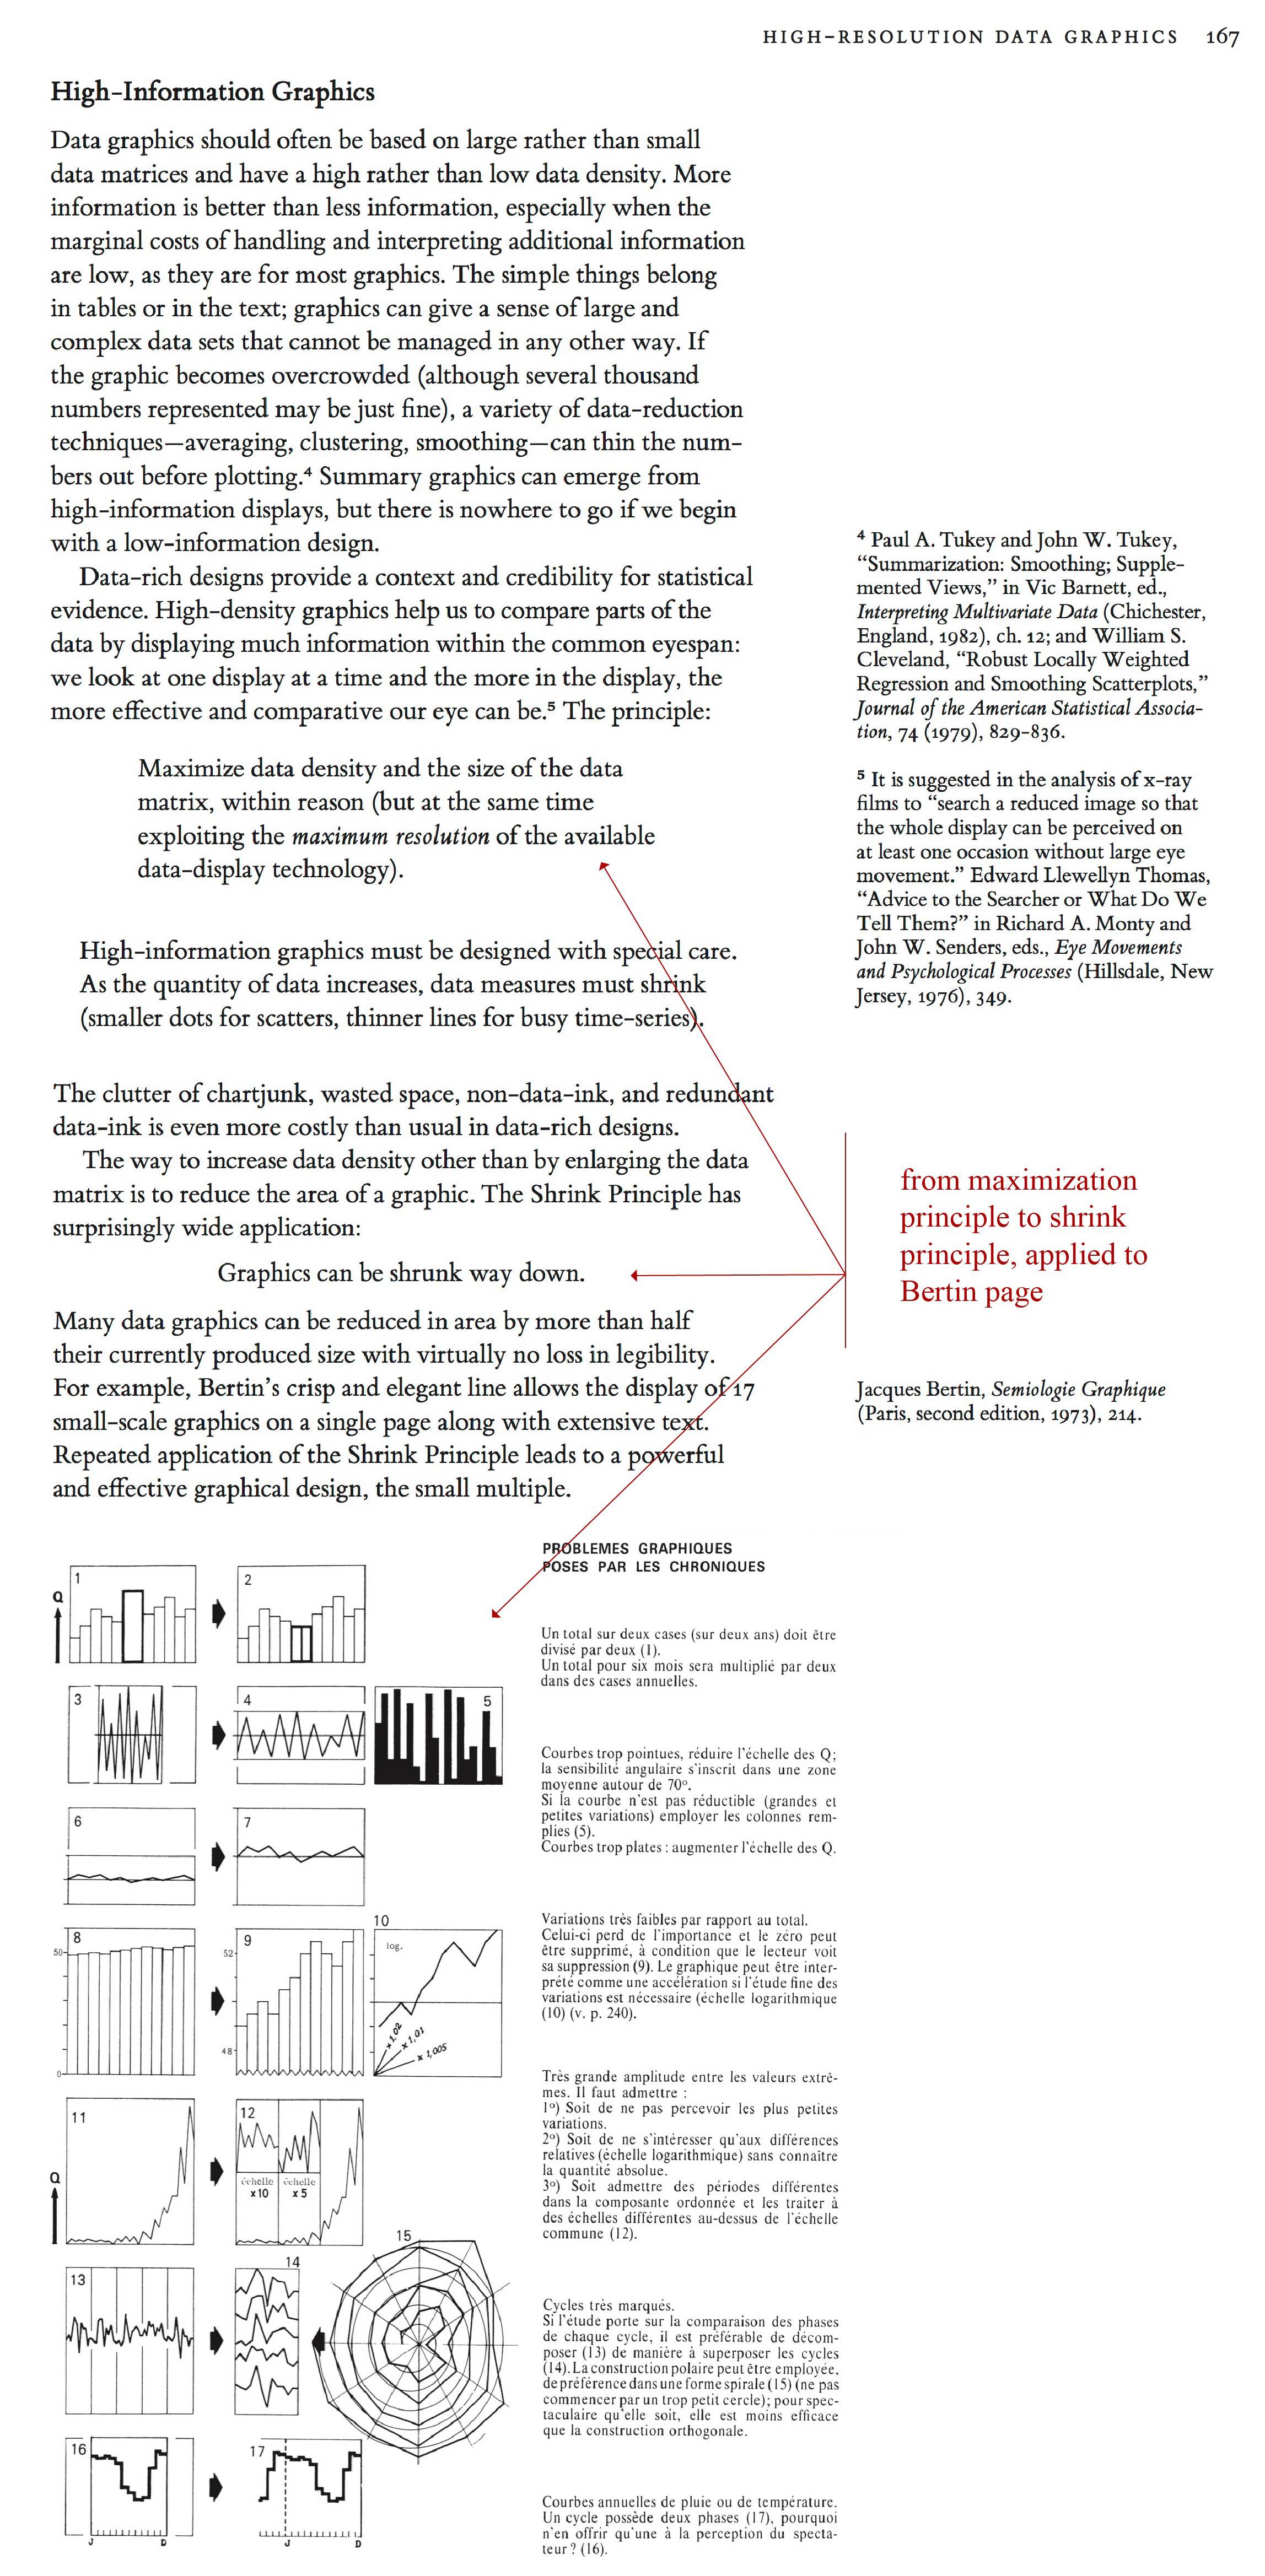 Tufte sparklines VDQI p. 166-167 Bertin